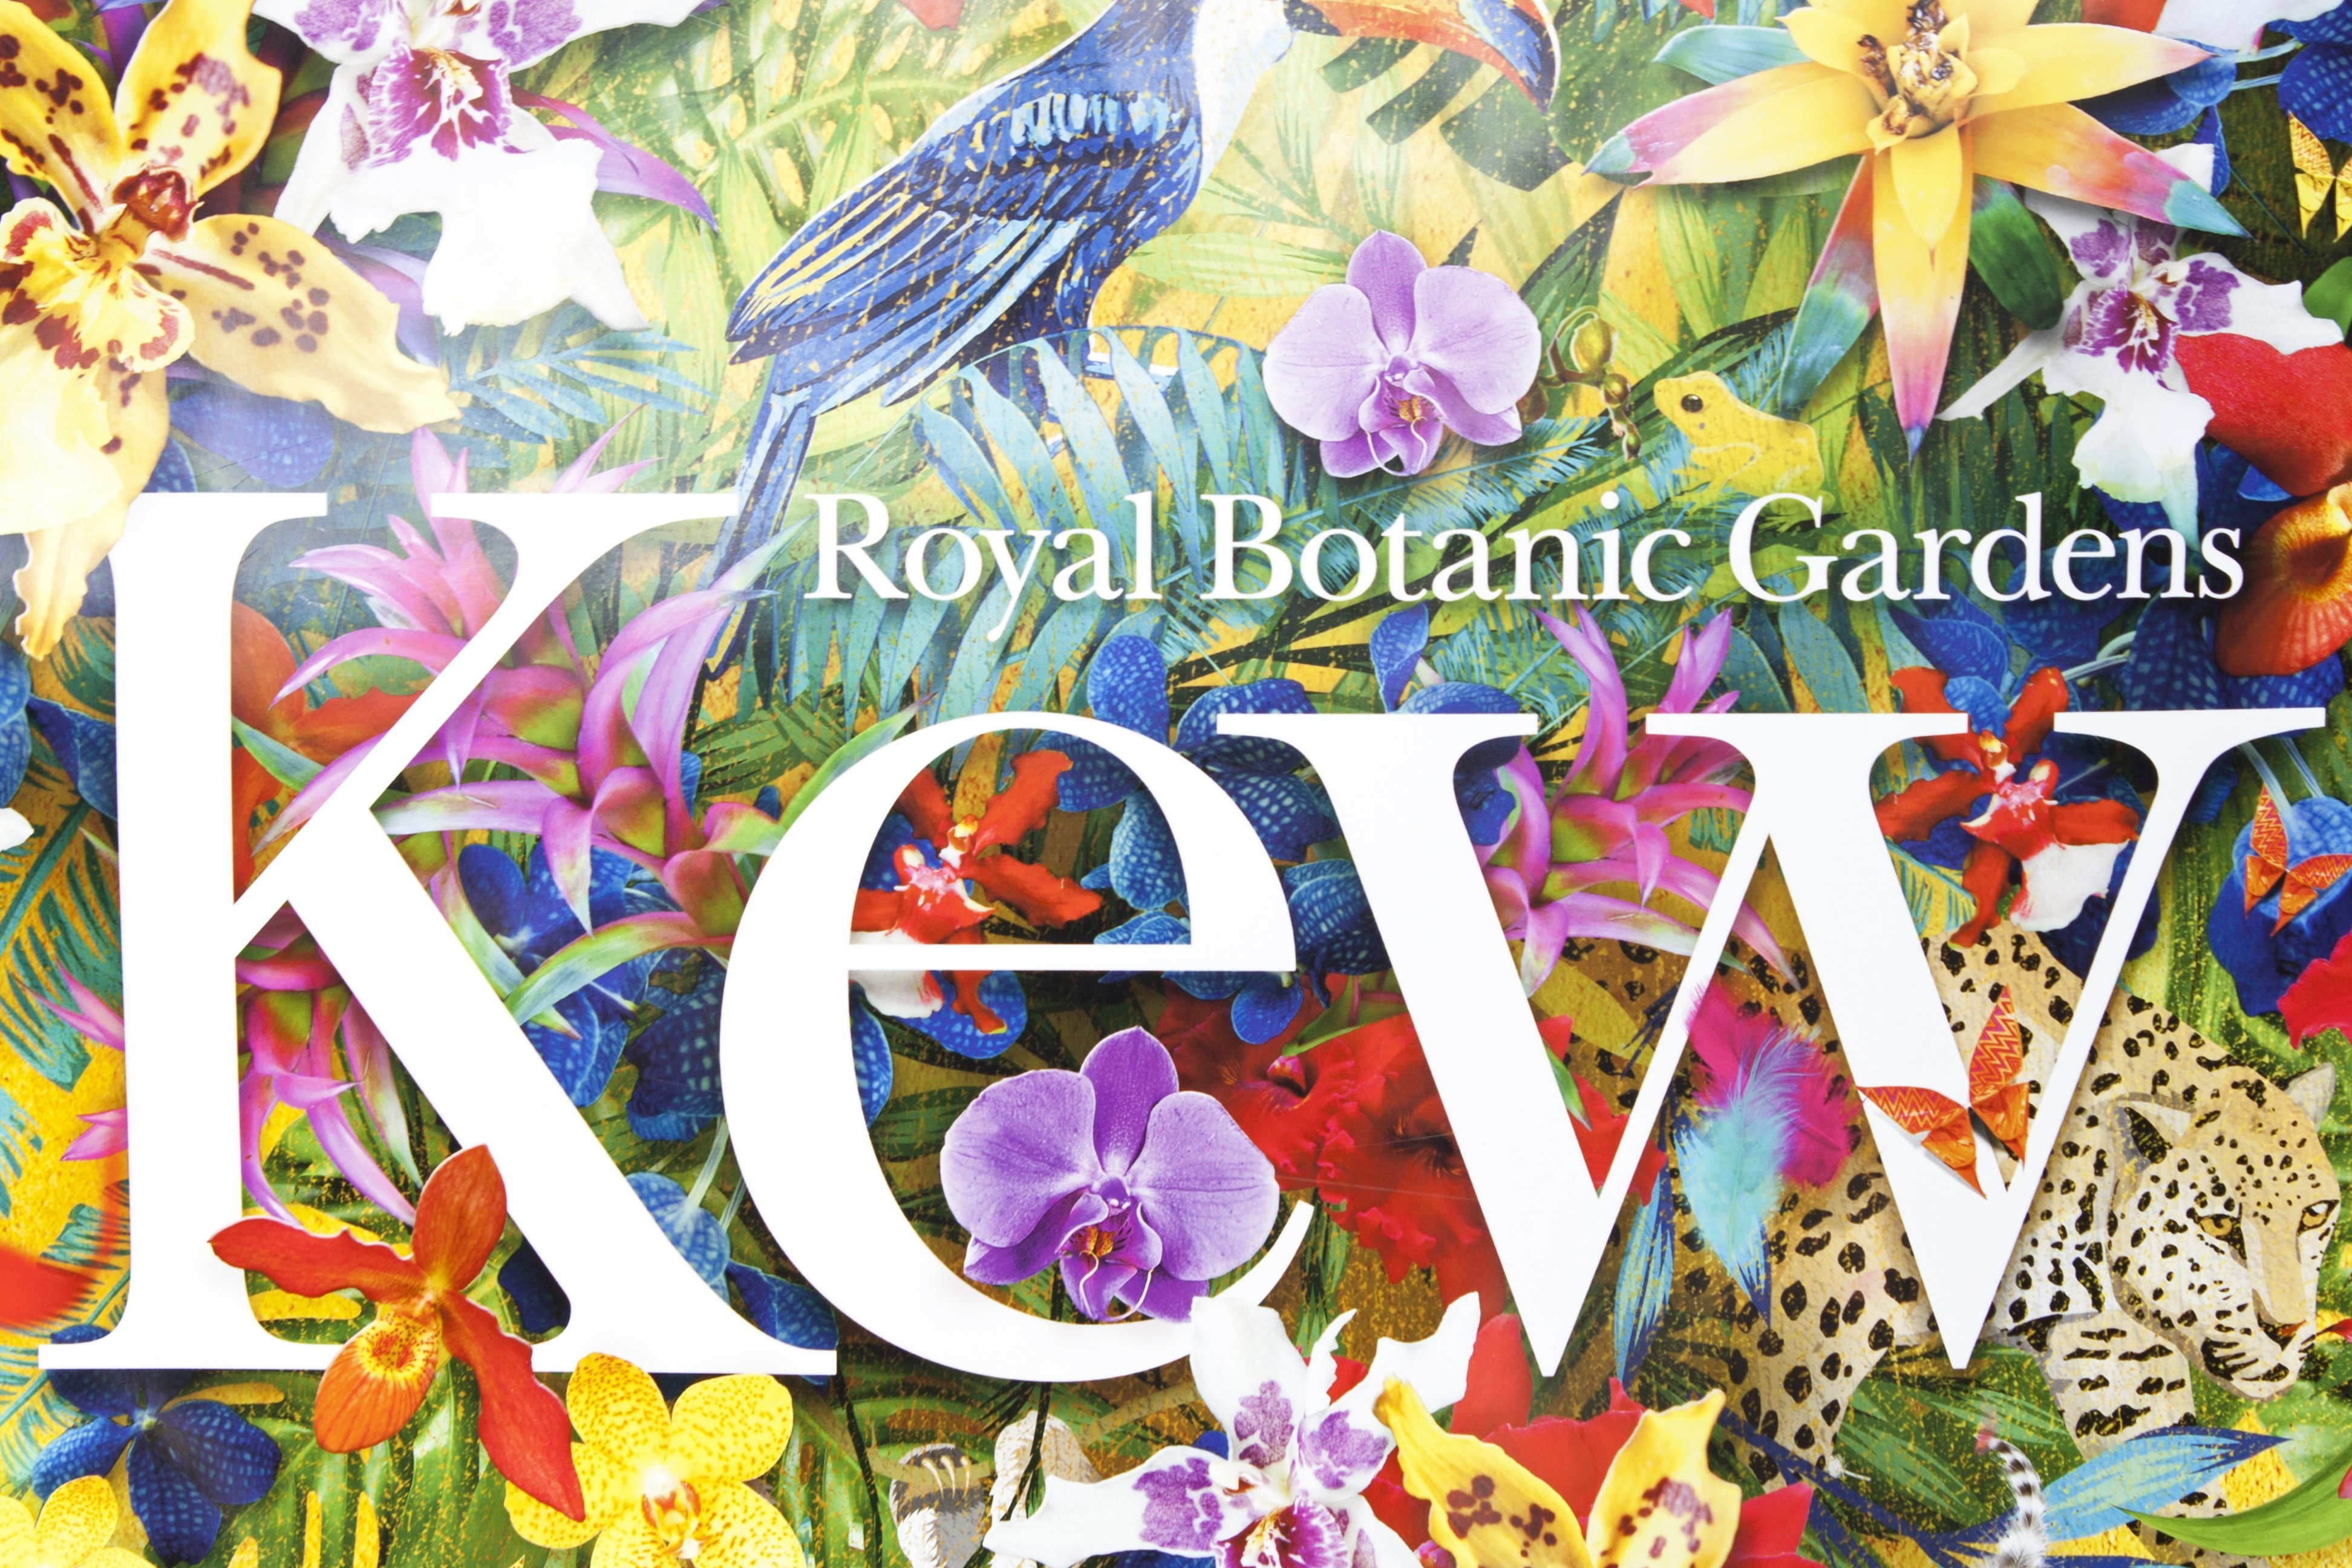 Royal Botanic Gardens Kew orchid festival poster